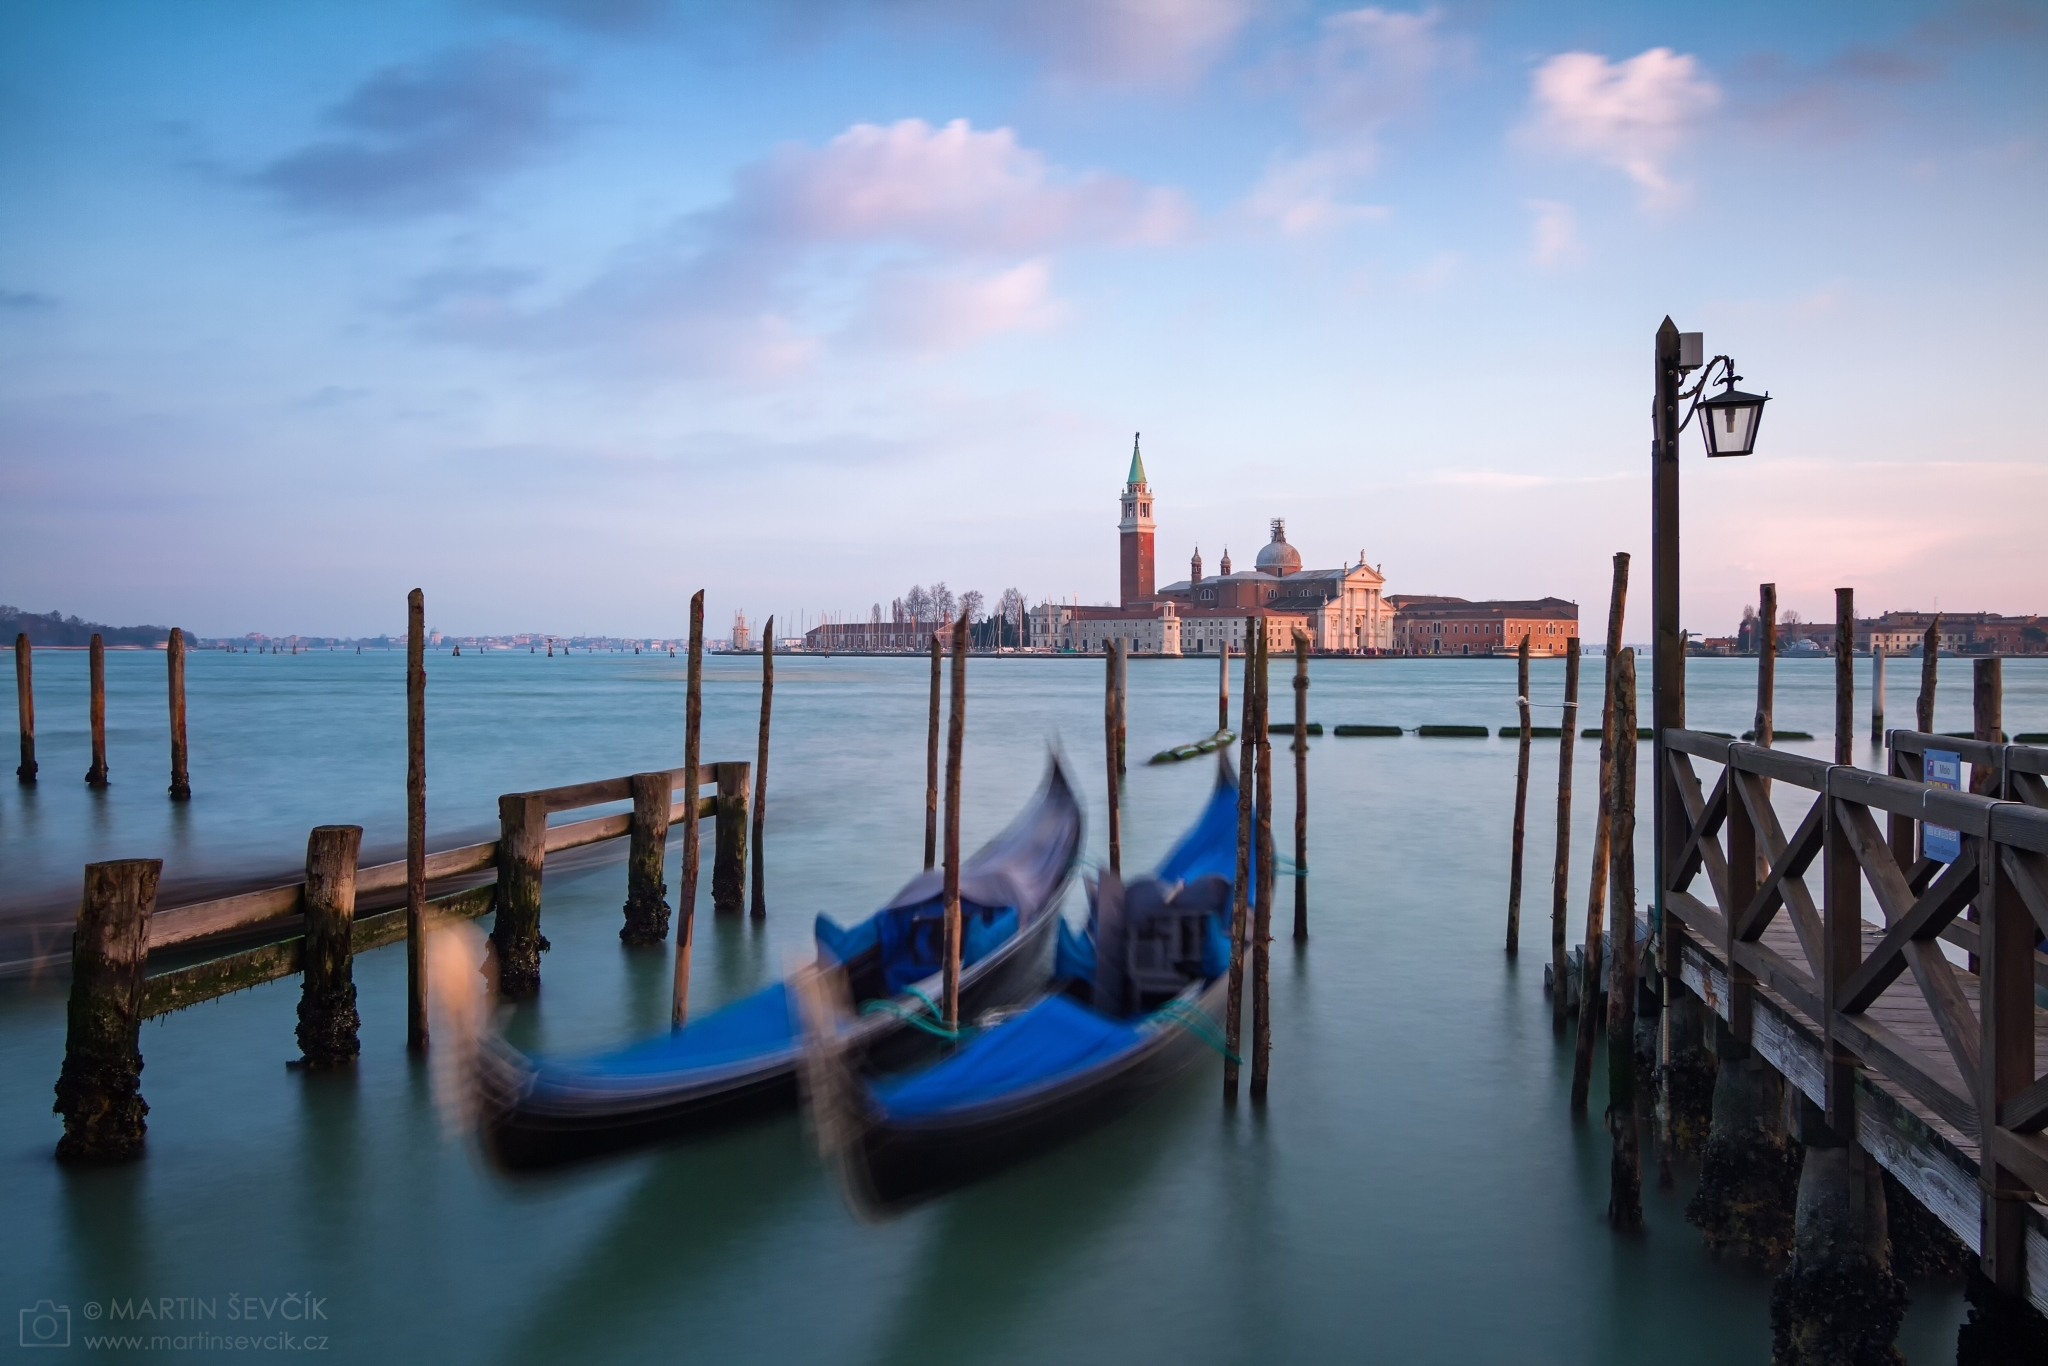 Rocking the Venetian gondolas on the Grand Canal against San Giorgio Maggiore Church